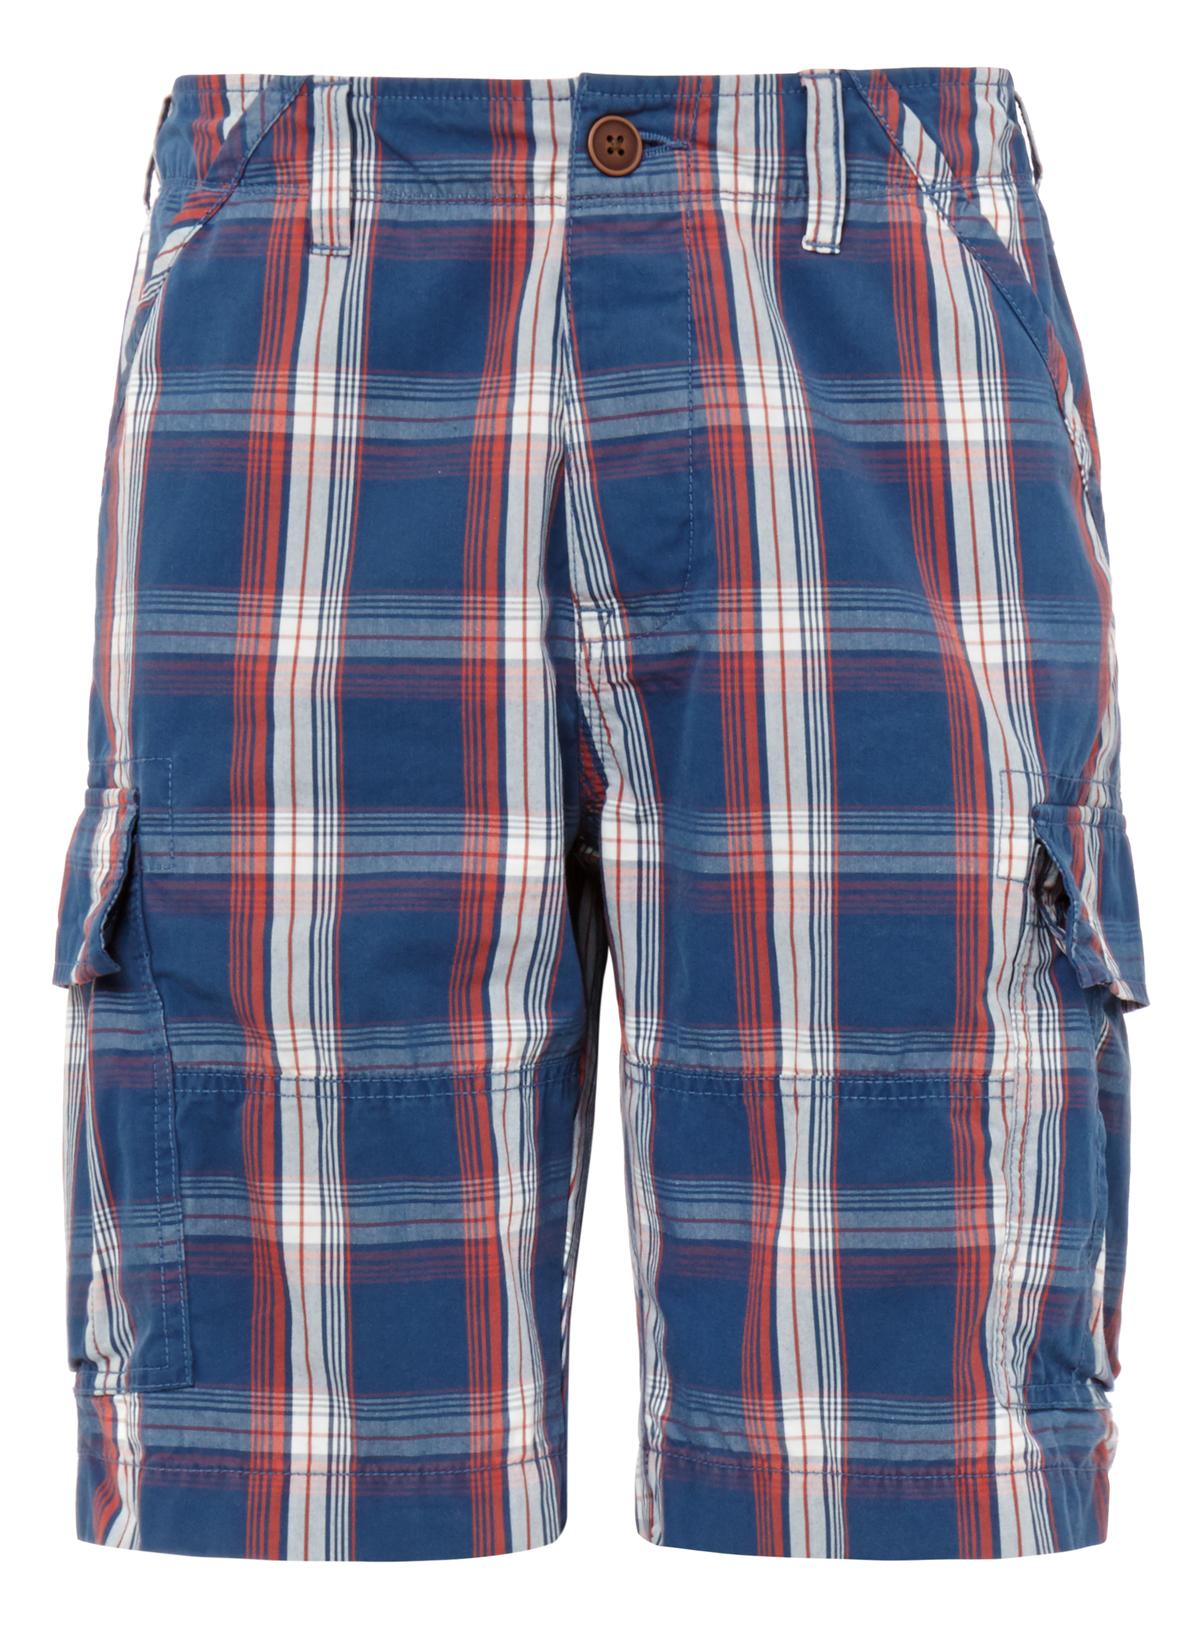 Mens Navy Checked Cargo Shorts | Tu clothing